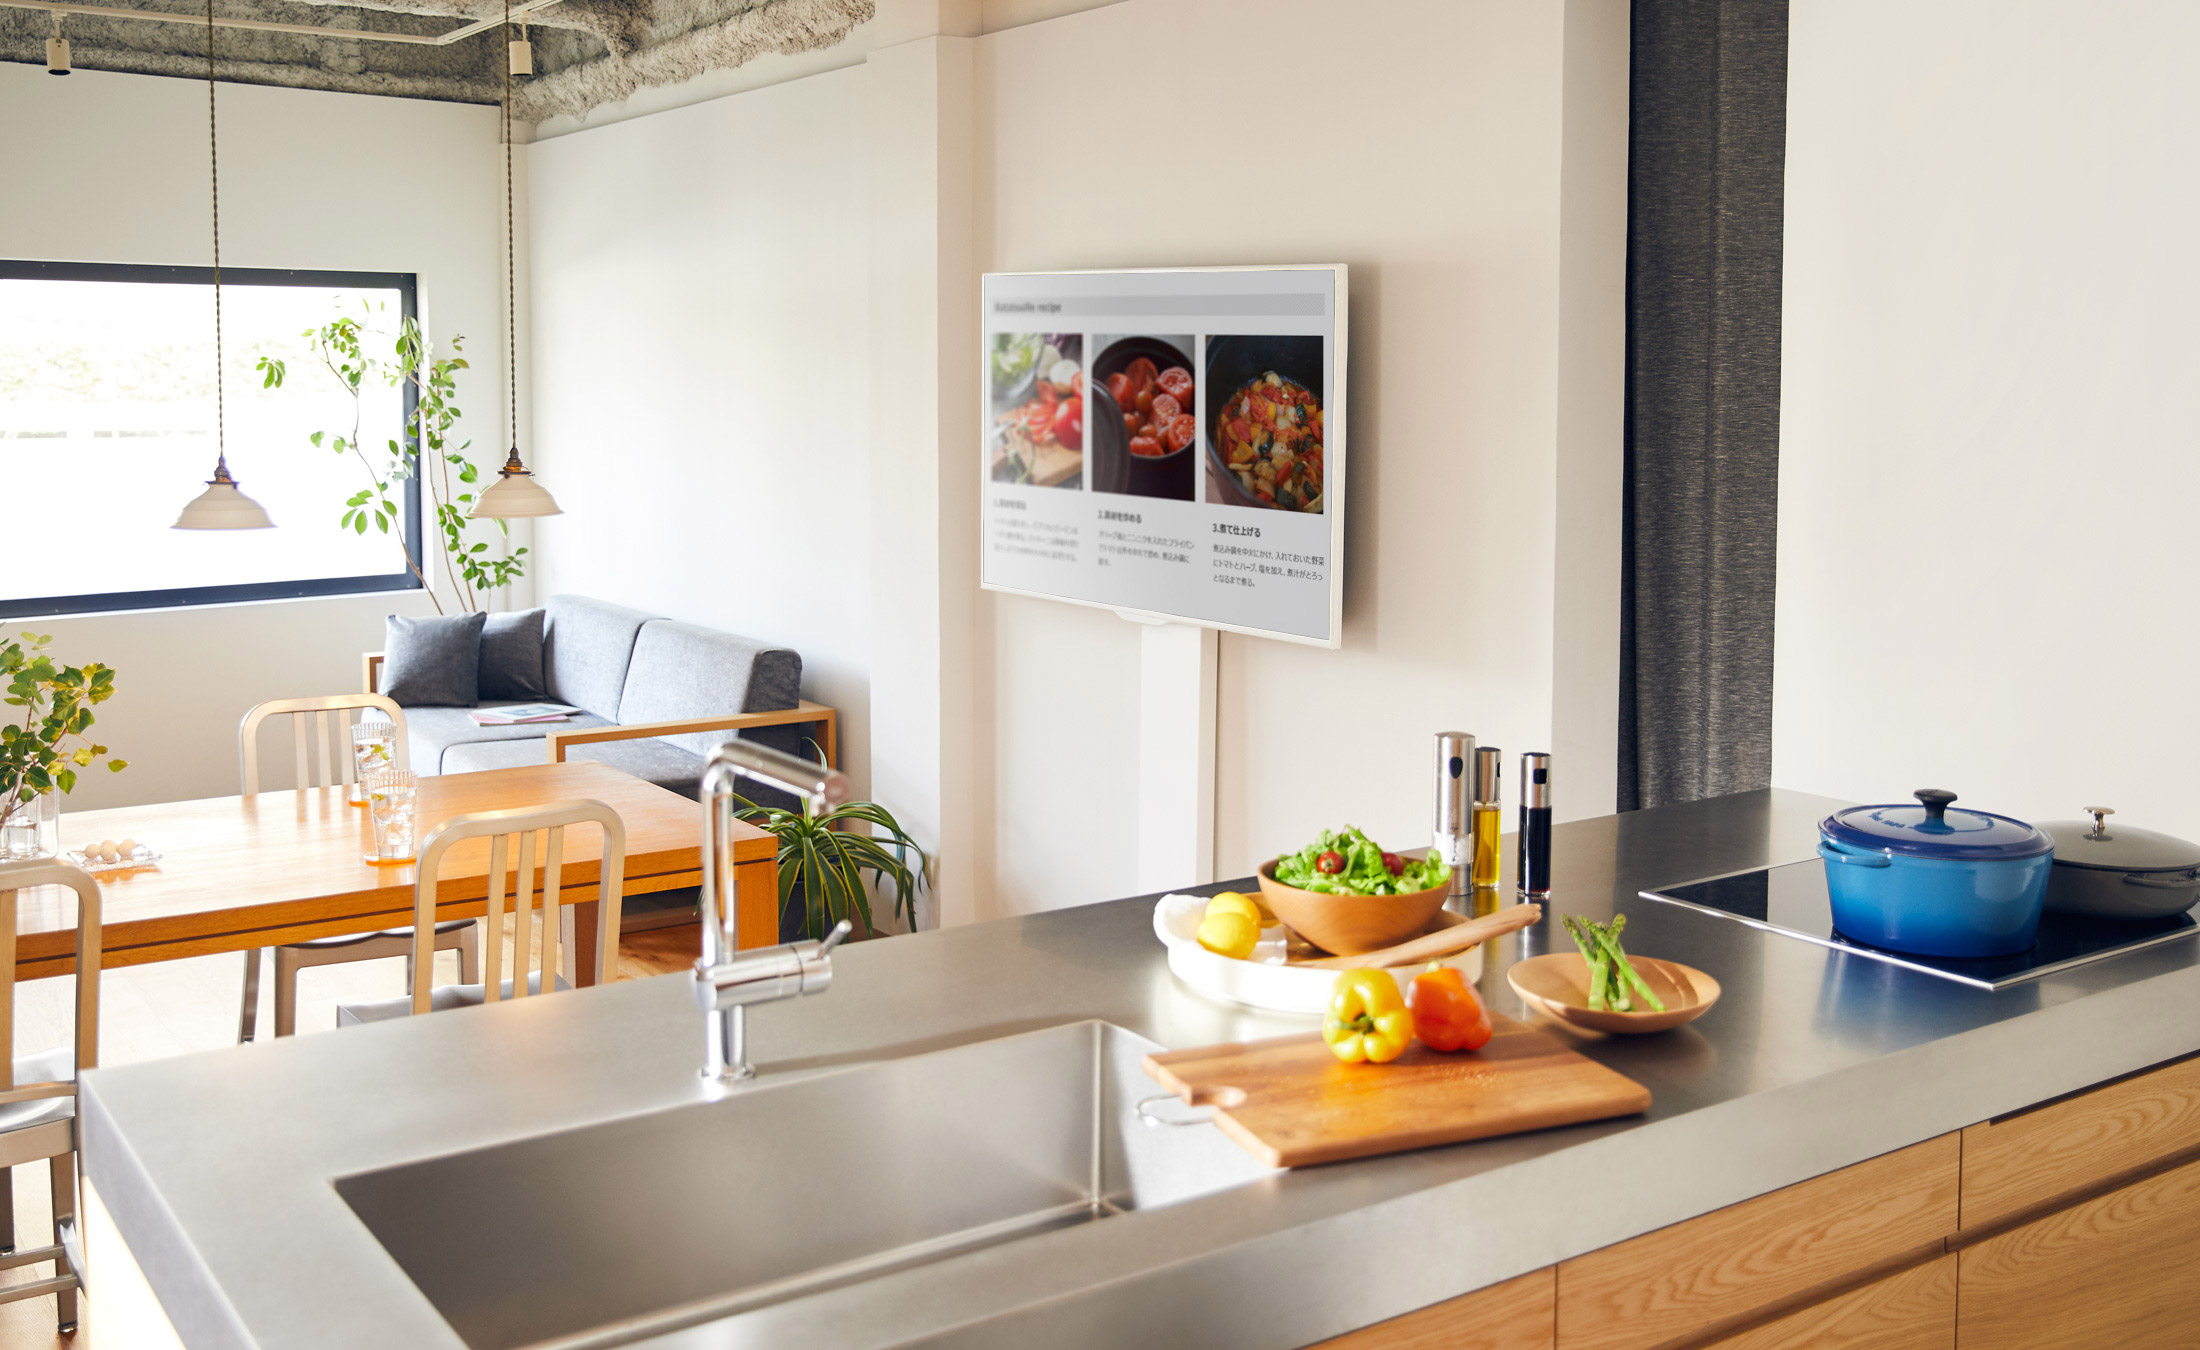 WALL INTERIOR TV STAND V3 壁寄せテレビスタンドV3 DINING & KITCHEN 3枚目